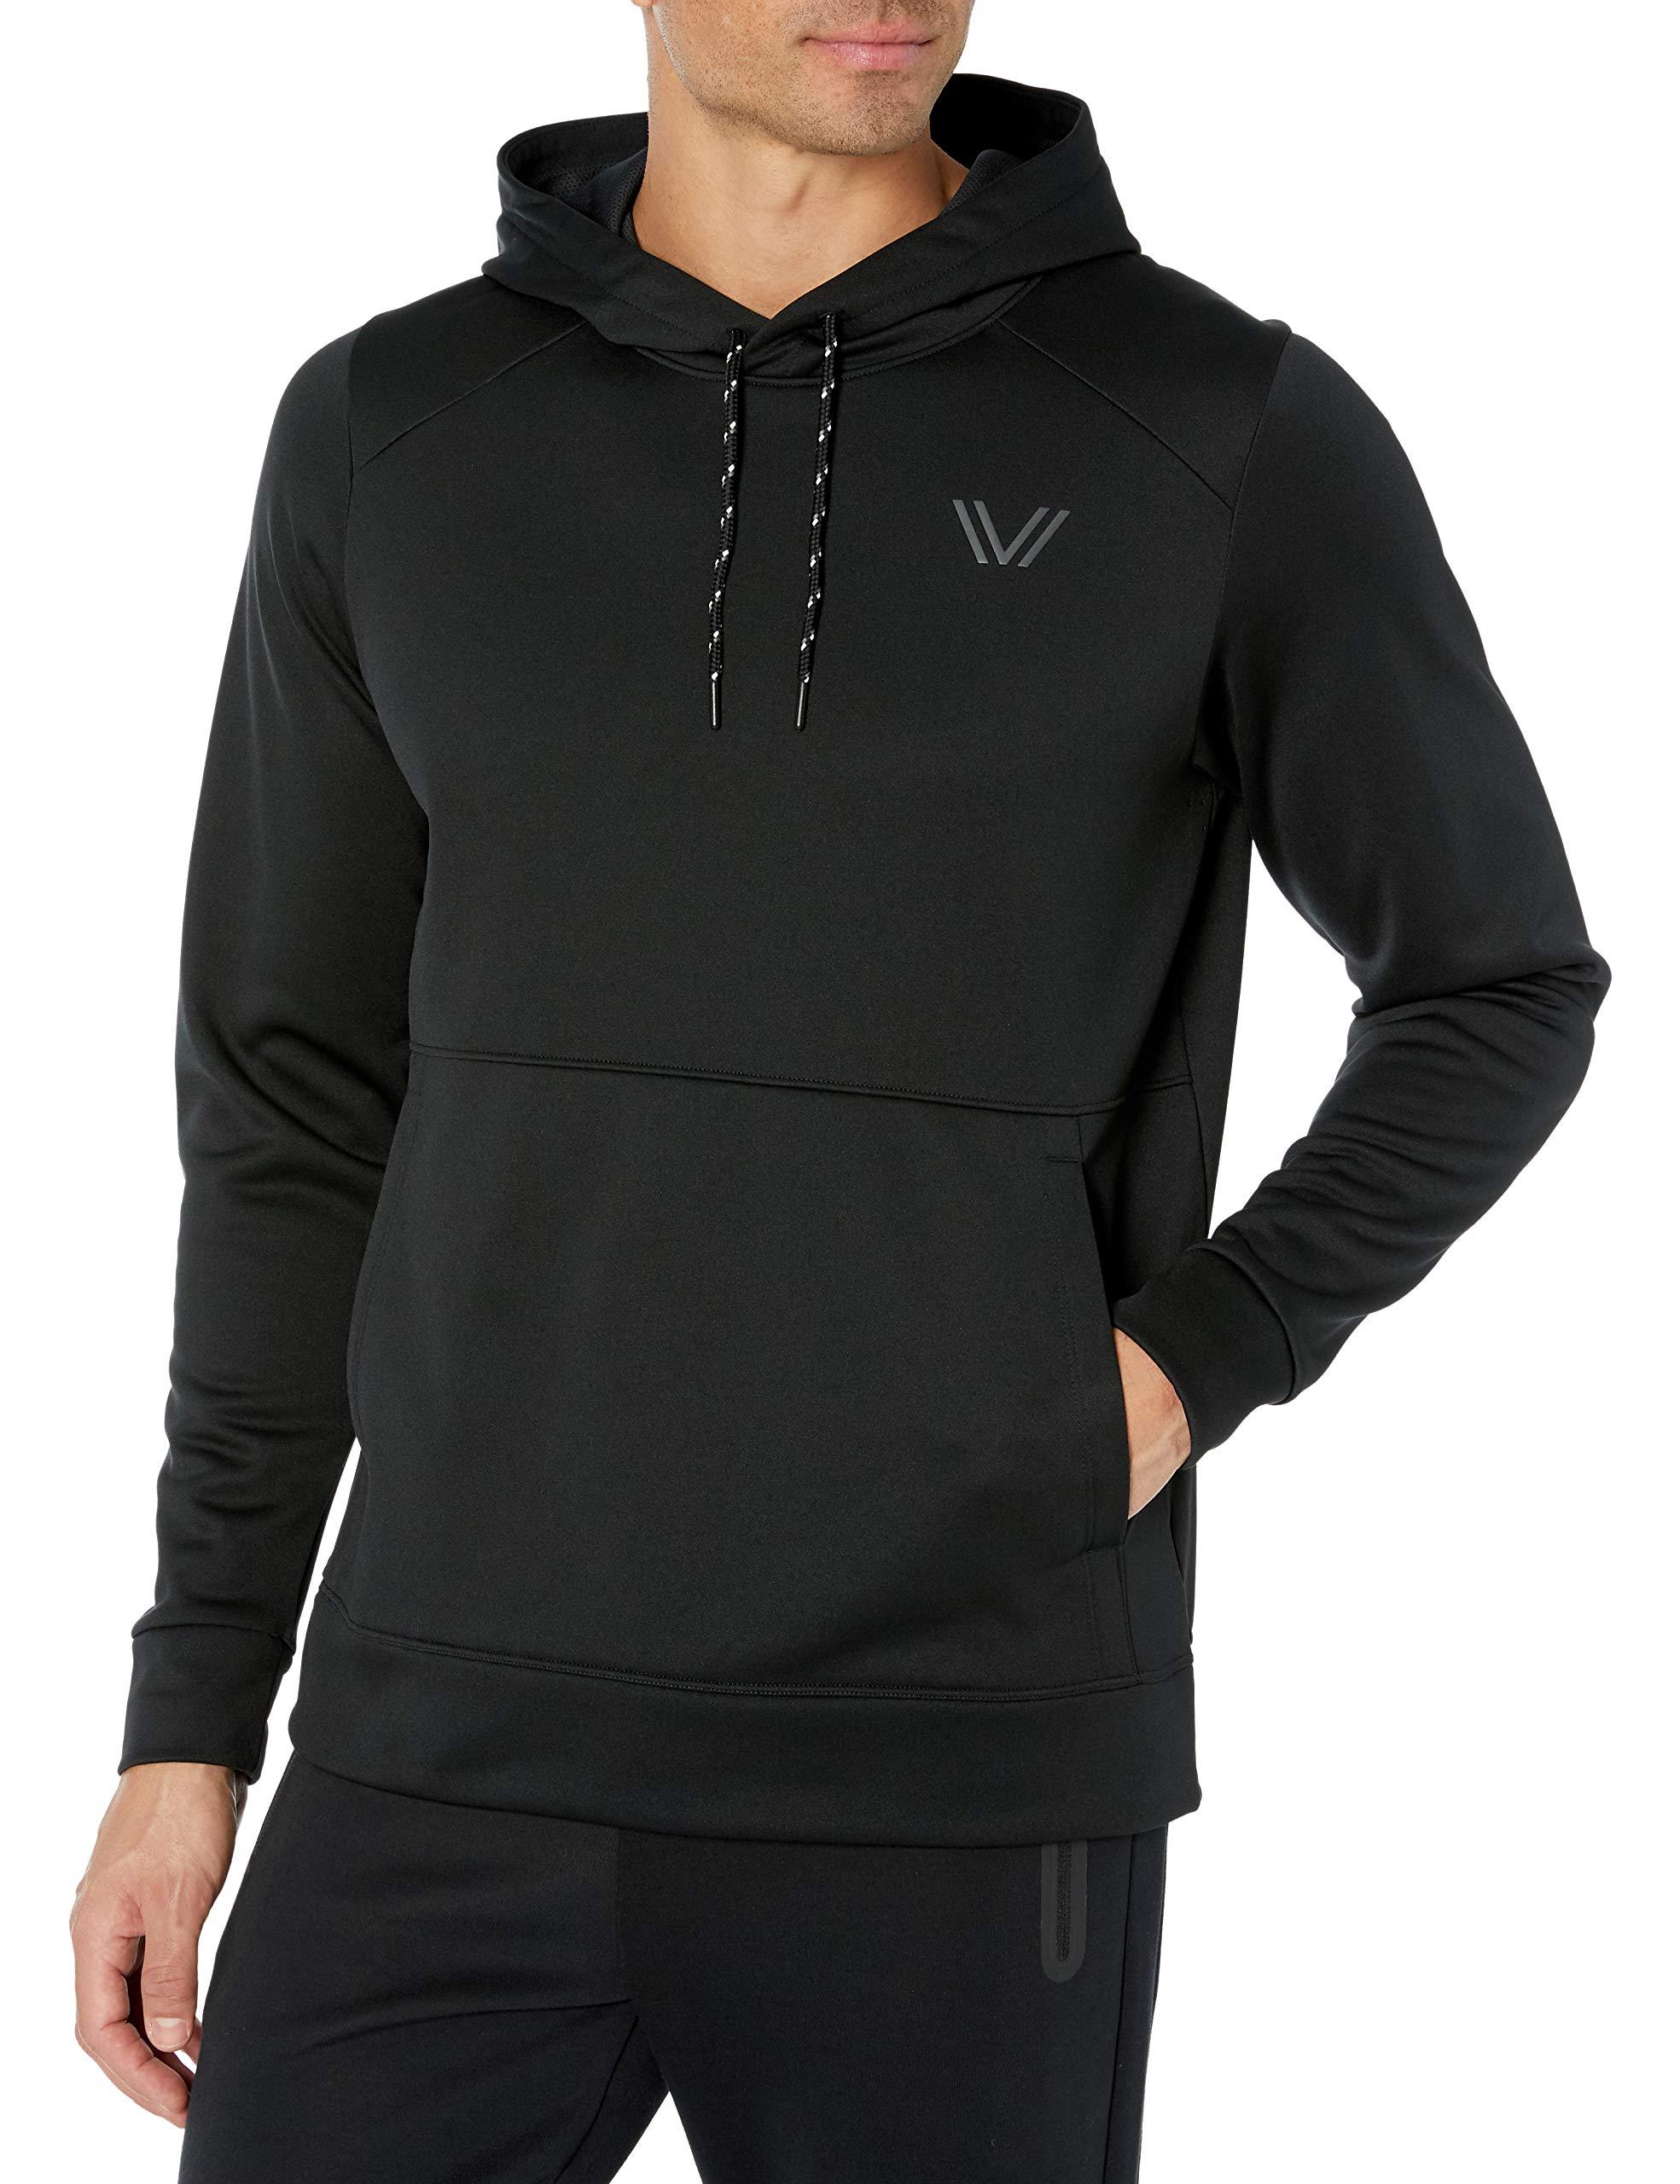 Amazon Brand - Peak Velocity Men's Quantum Fleece Pull-Over Loose-Fit Hoodie